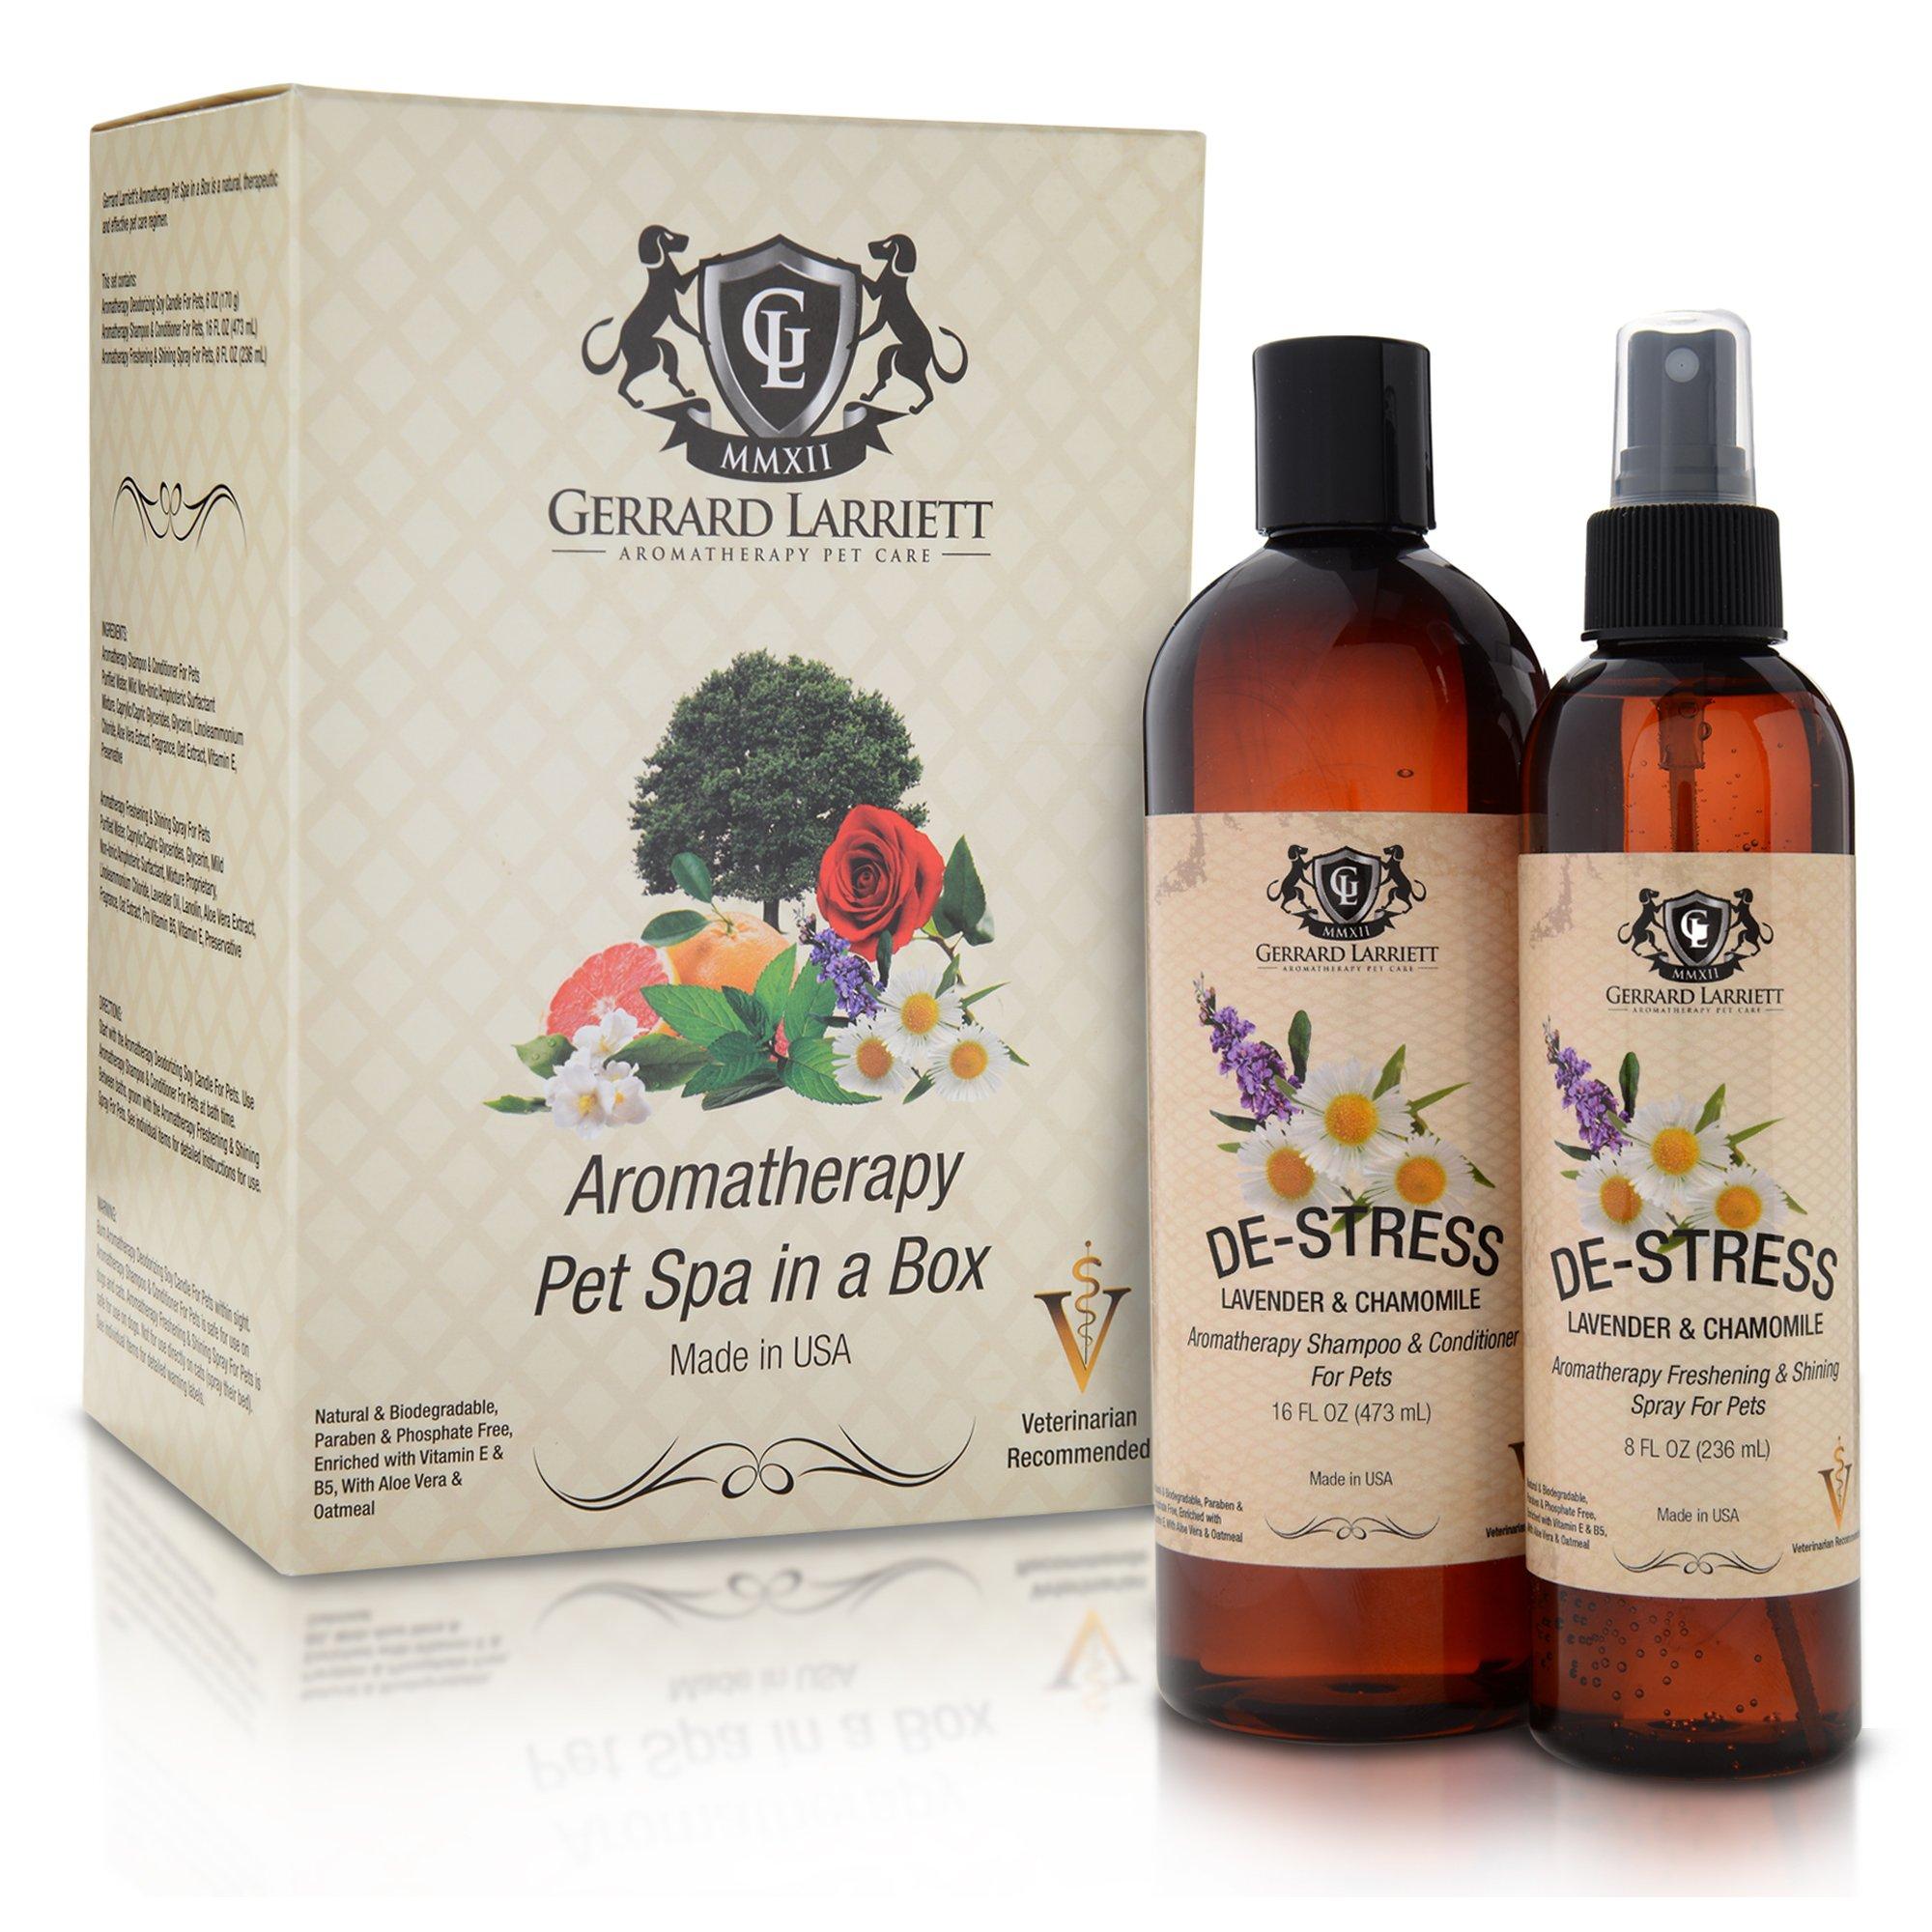 Lavender & Chamomile Aromatherapy Pet Spa Duo Dog Shampoo & Dog Grooming Spray Animal Lover Gift Set & Pet Odor Eliminator